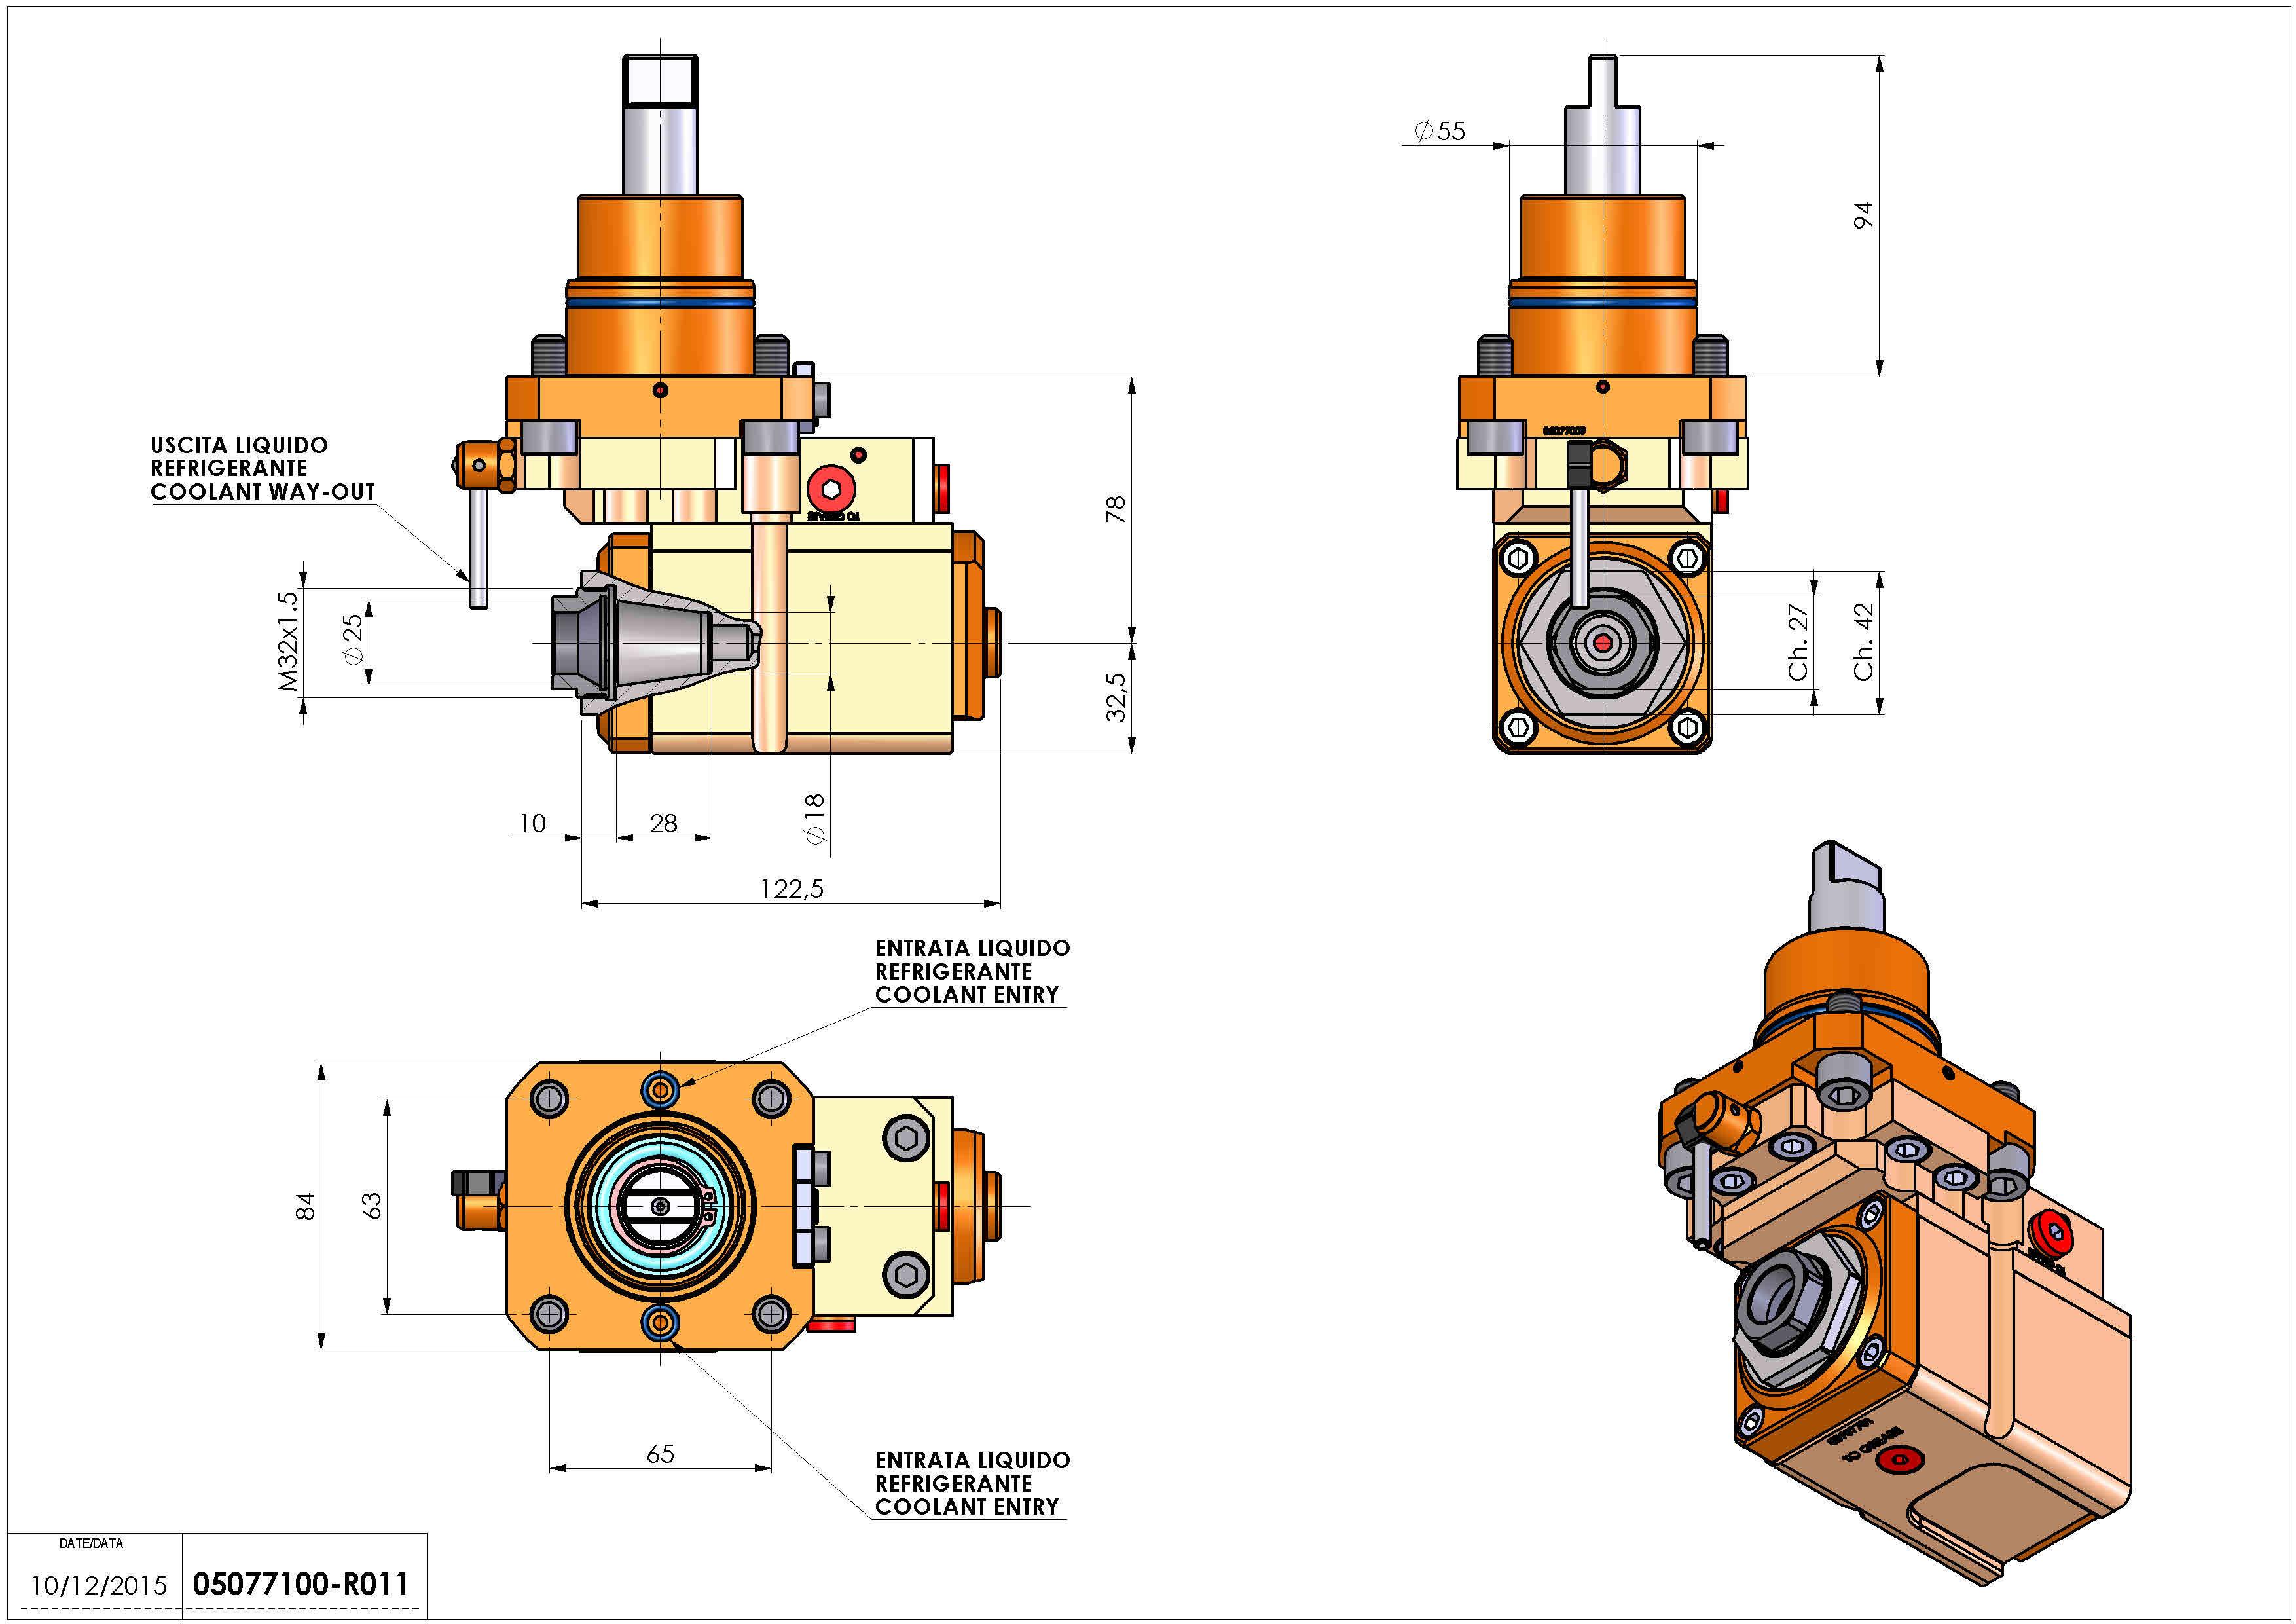 Technical image - LT-A D55 ER25F LR OFS H78 BI.